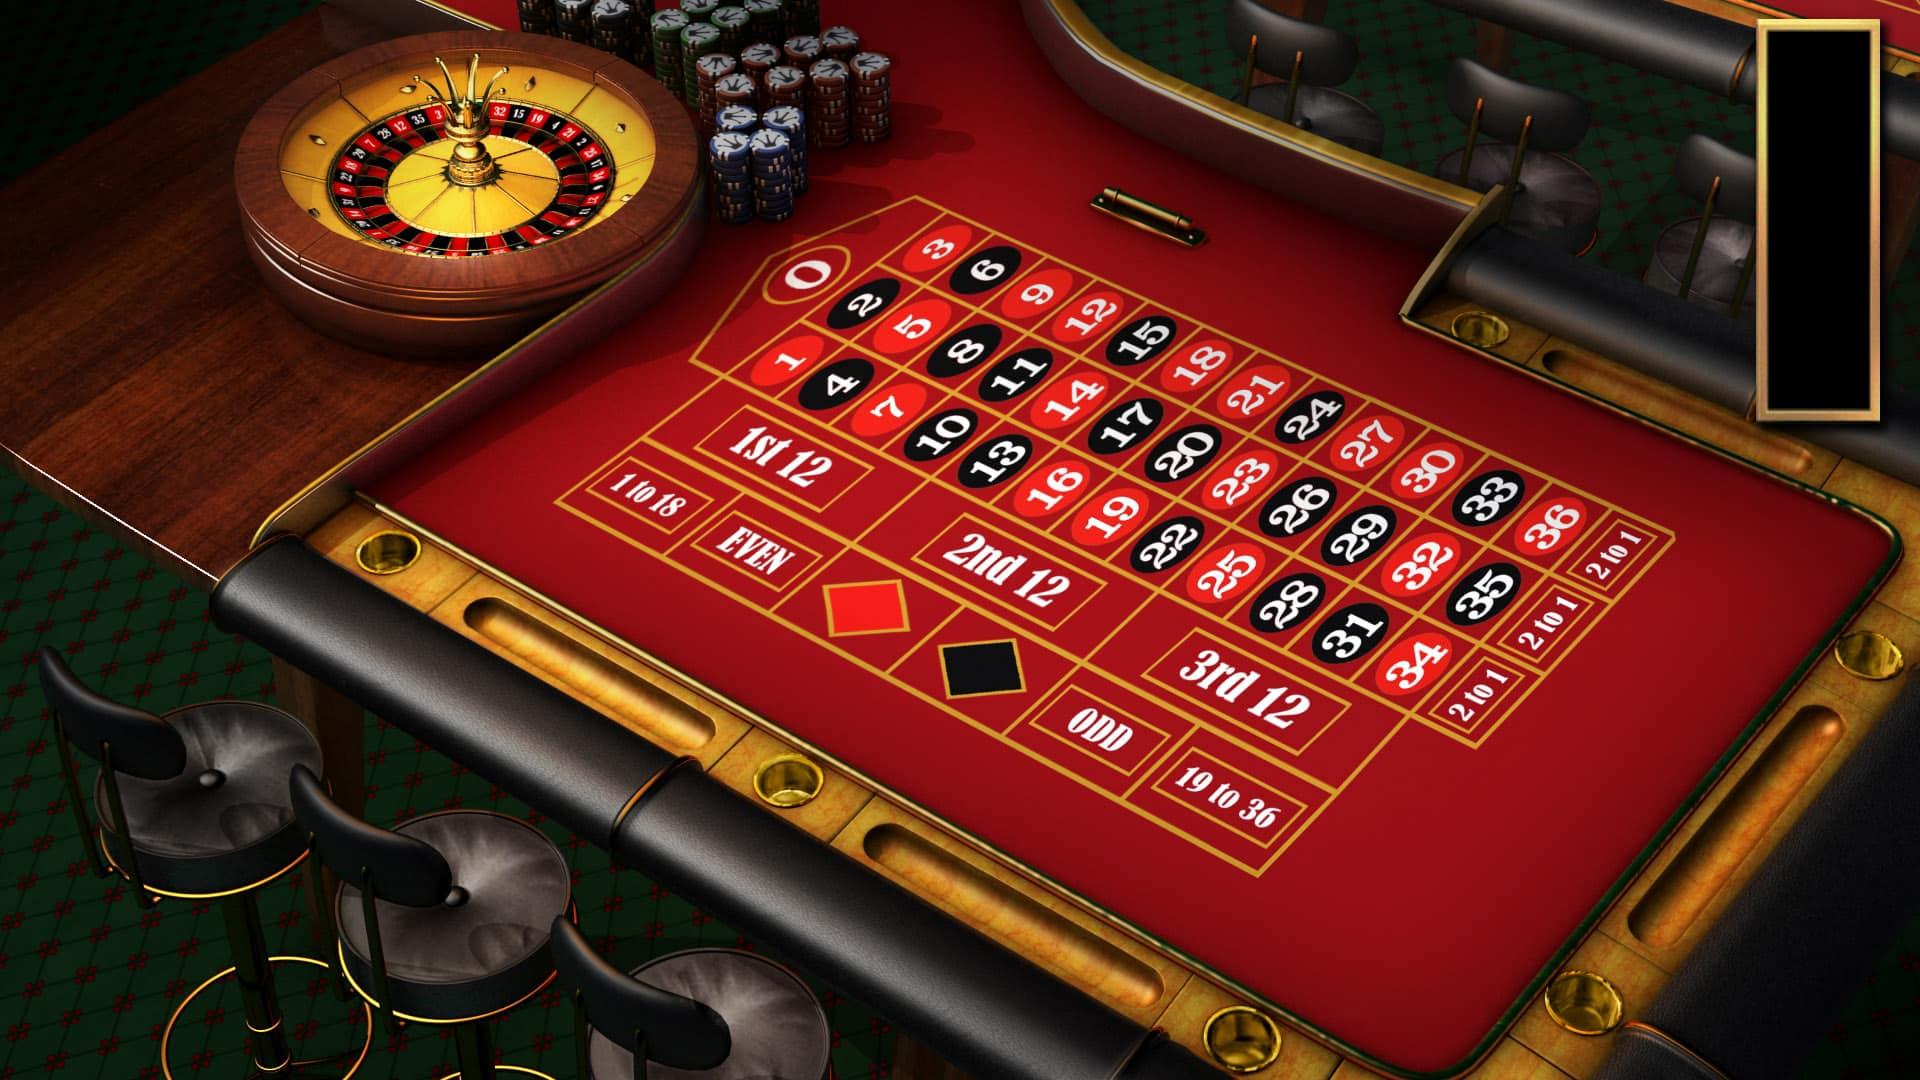 Blackjack Layout Full Size Felt Genuine Casino Quality Wheel of Madness